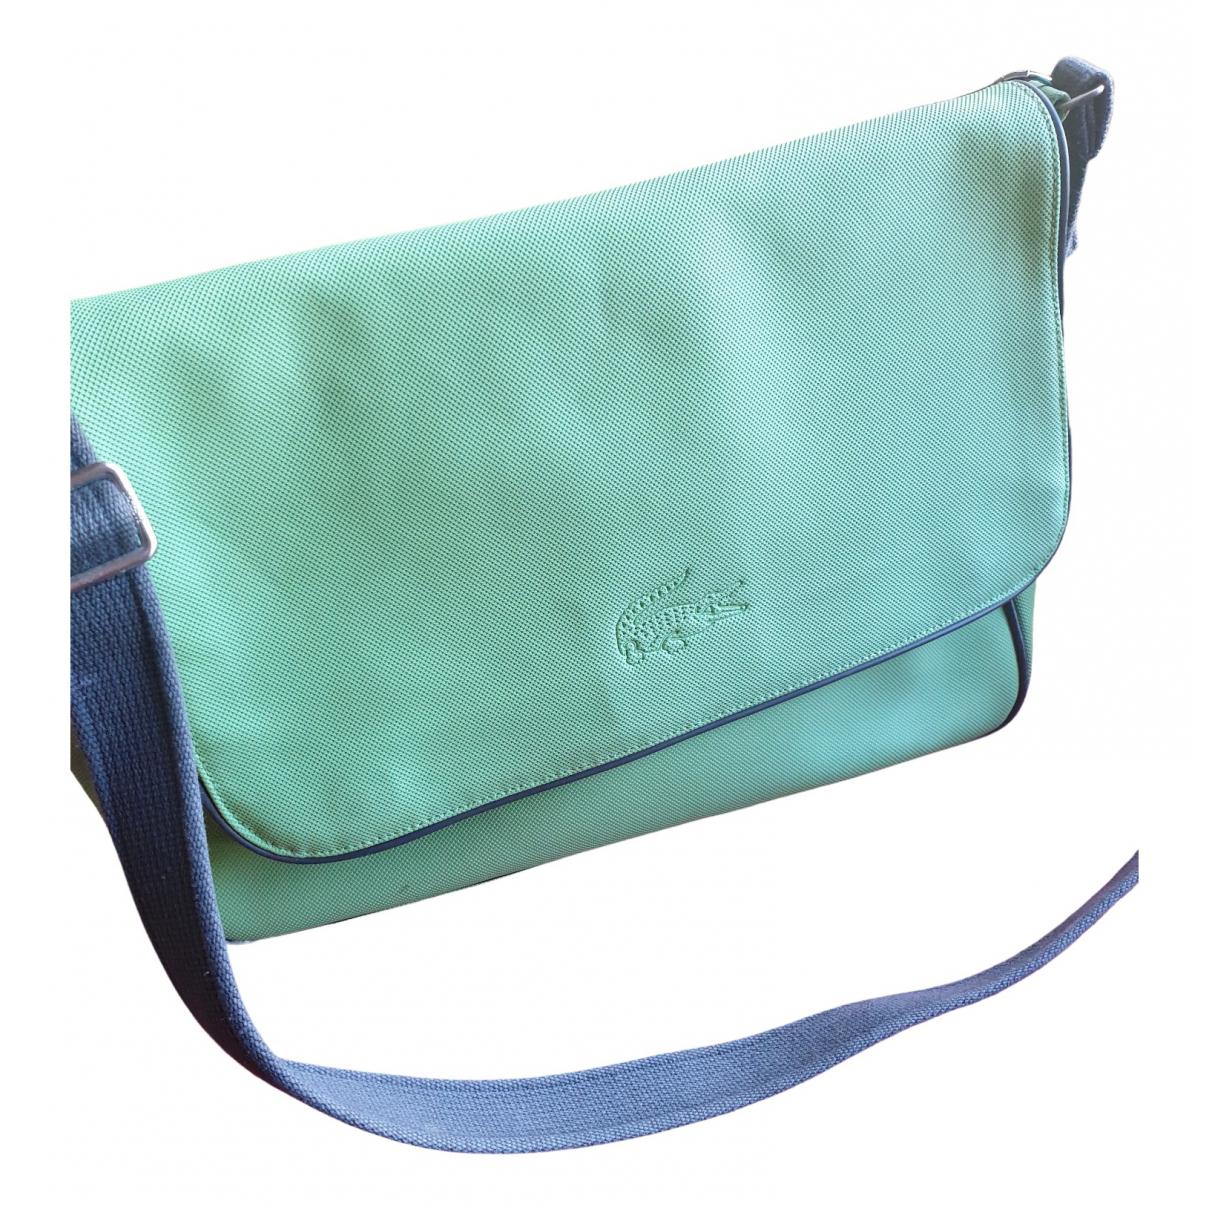 Lacoste \N Green Cloth handbag for Women \N